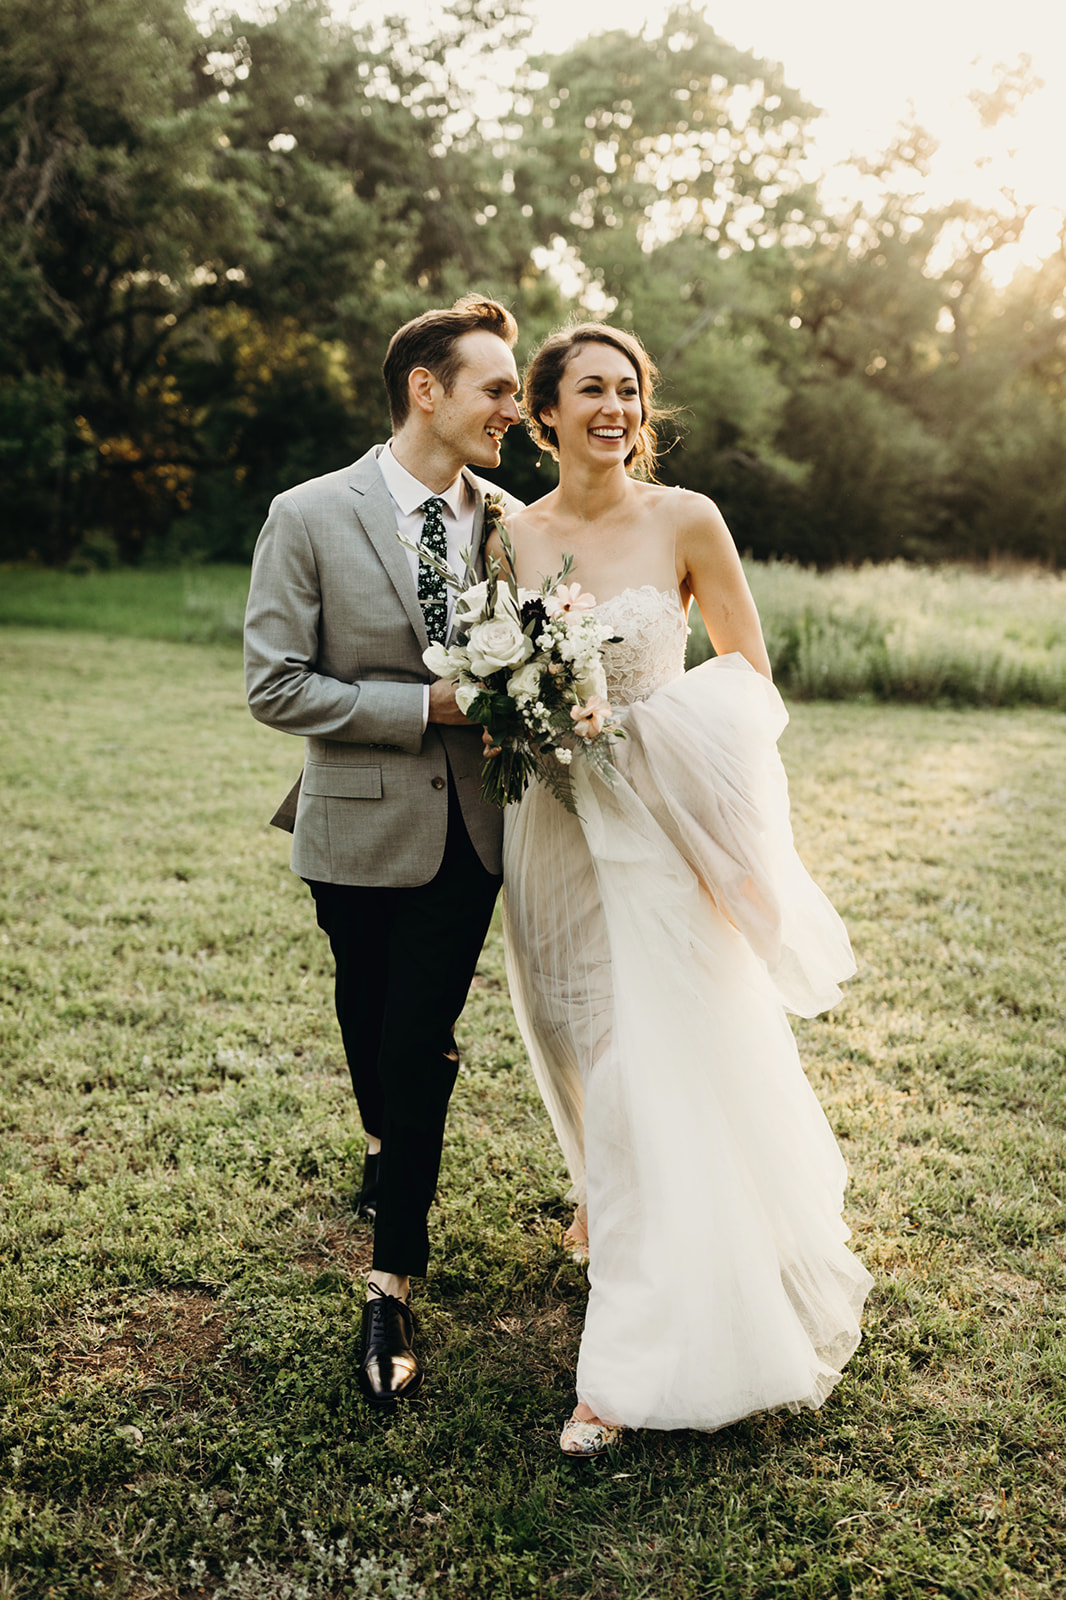 austin-wedding-lindsey-bryce-505.jpg